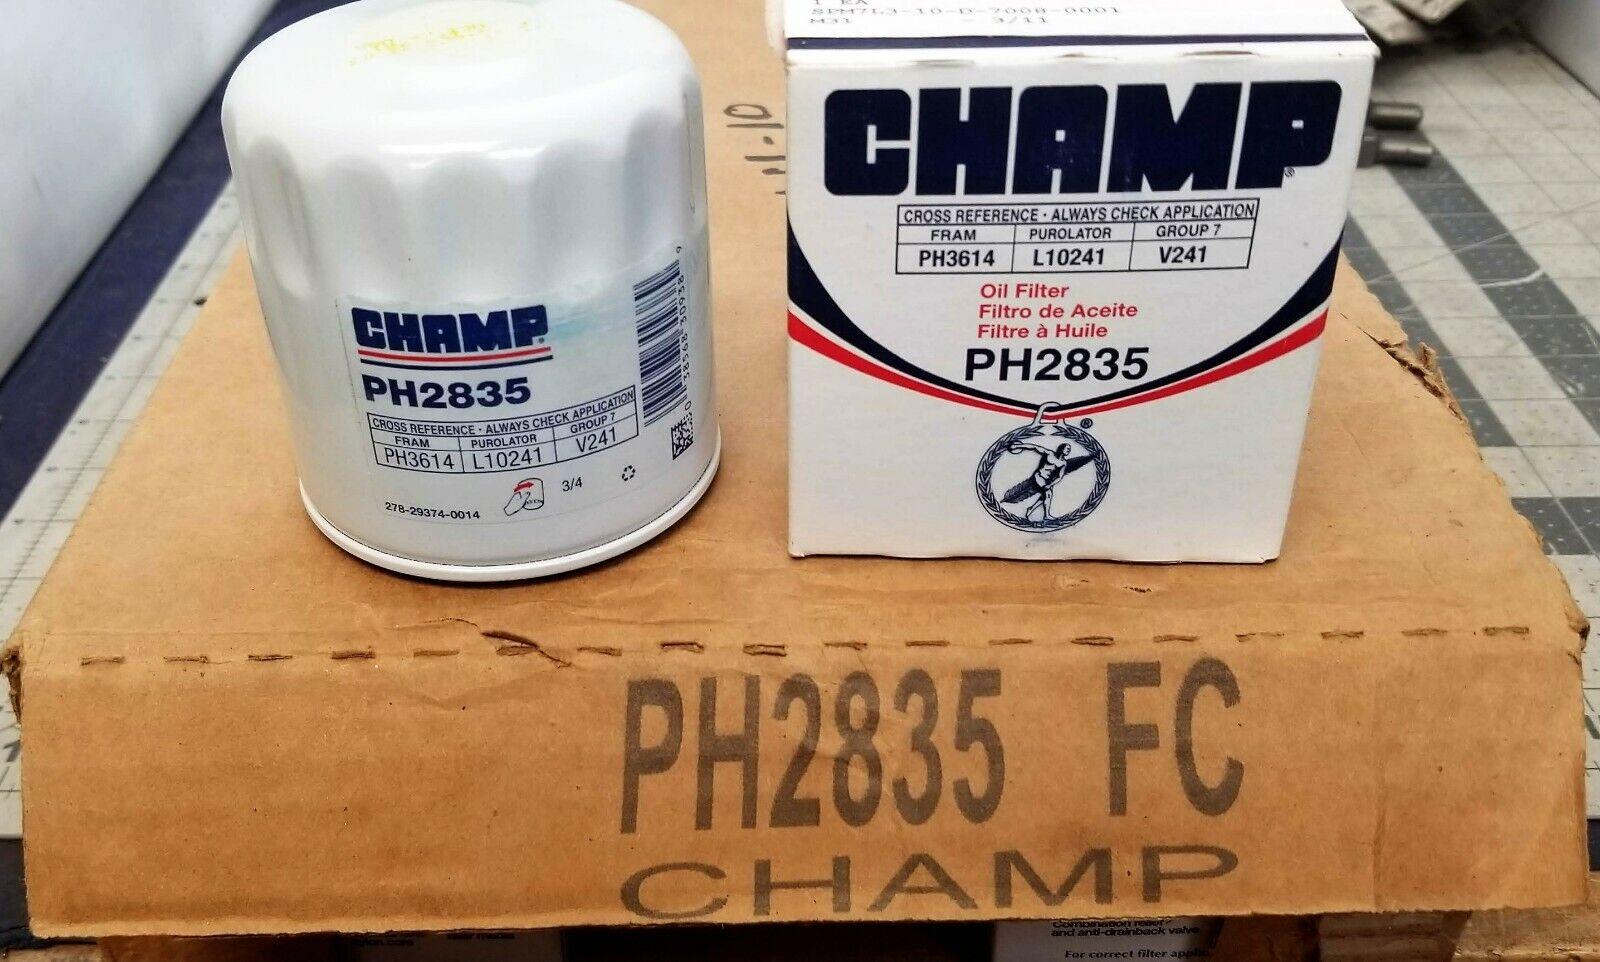 PH2835 CHAMP FILTER REPLACES FRAM PH3614, DELCO PF53, WIX 51348,PUROLATER 10241